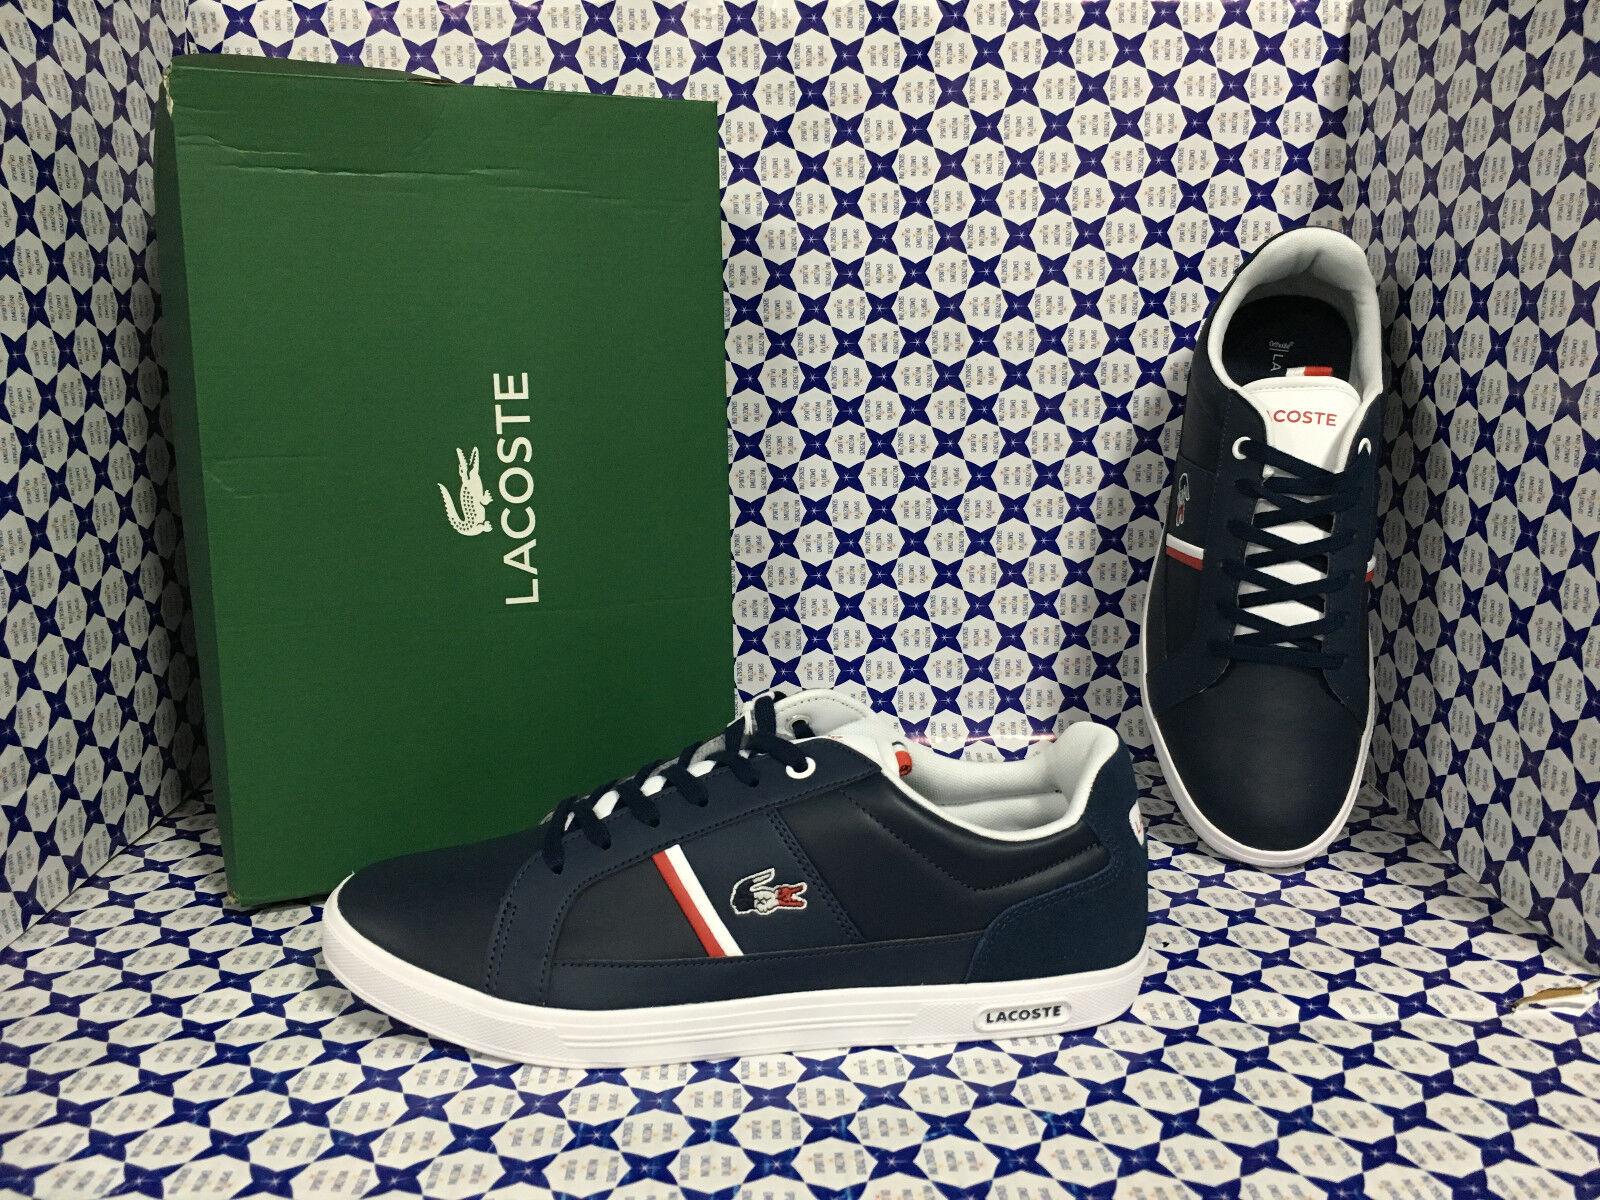 shoes Lacoste men - Europa 317 1 SPM - blue Bianco - SPM001